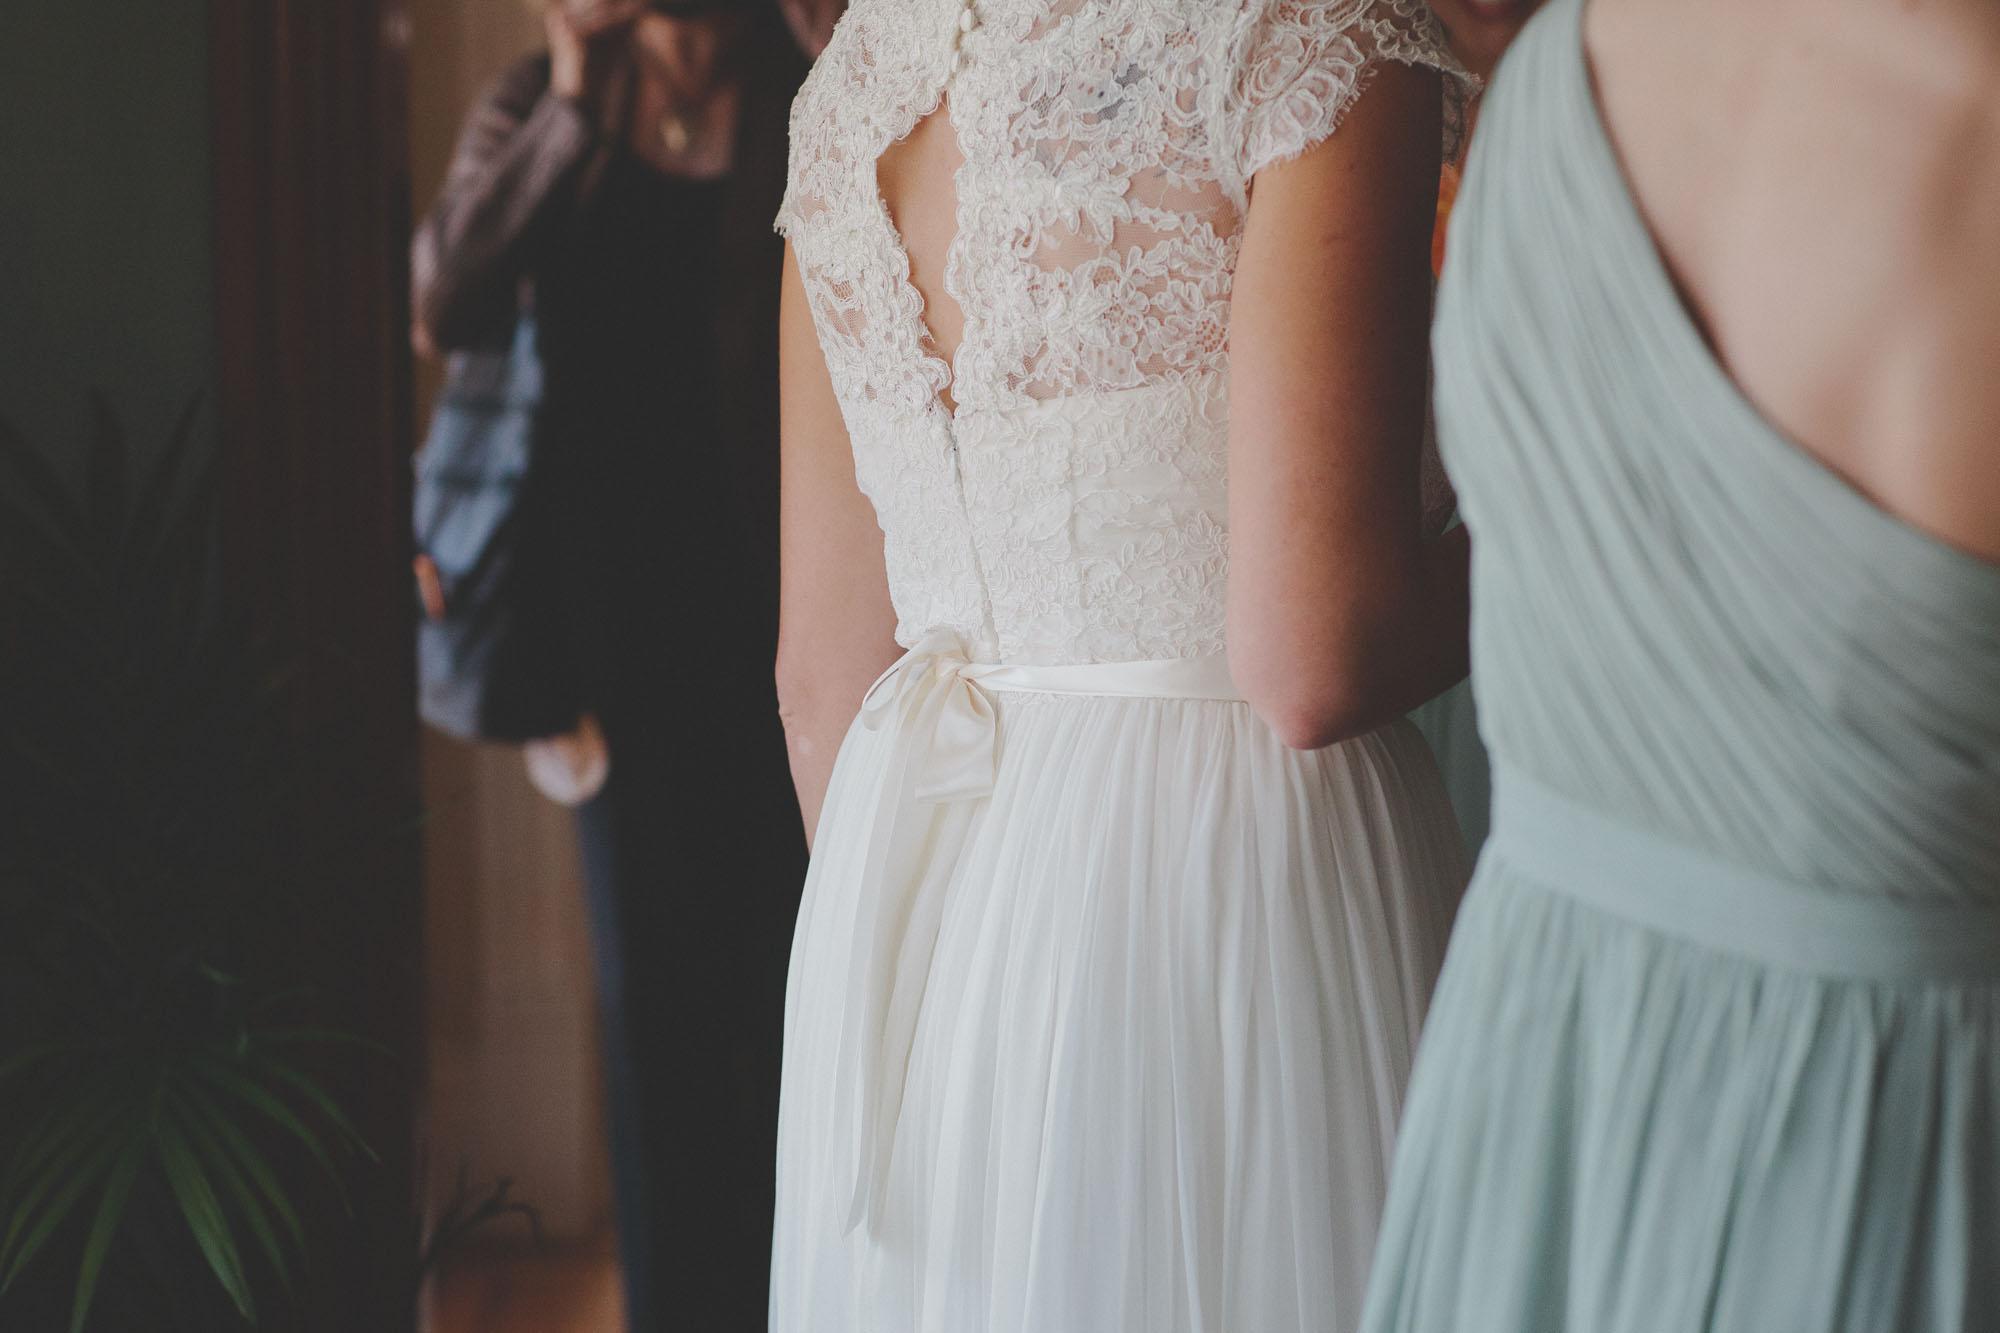 Gretchen_Gause_Petaluma_Olympias_Valley_Wedding_Photo-127.jpg